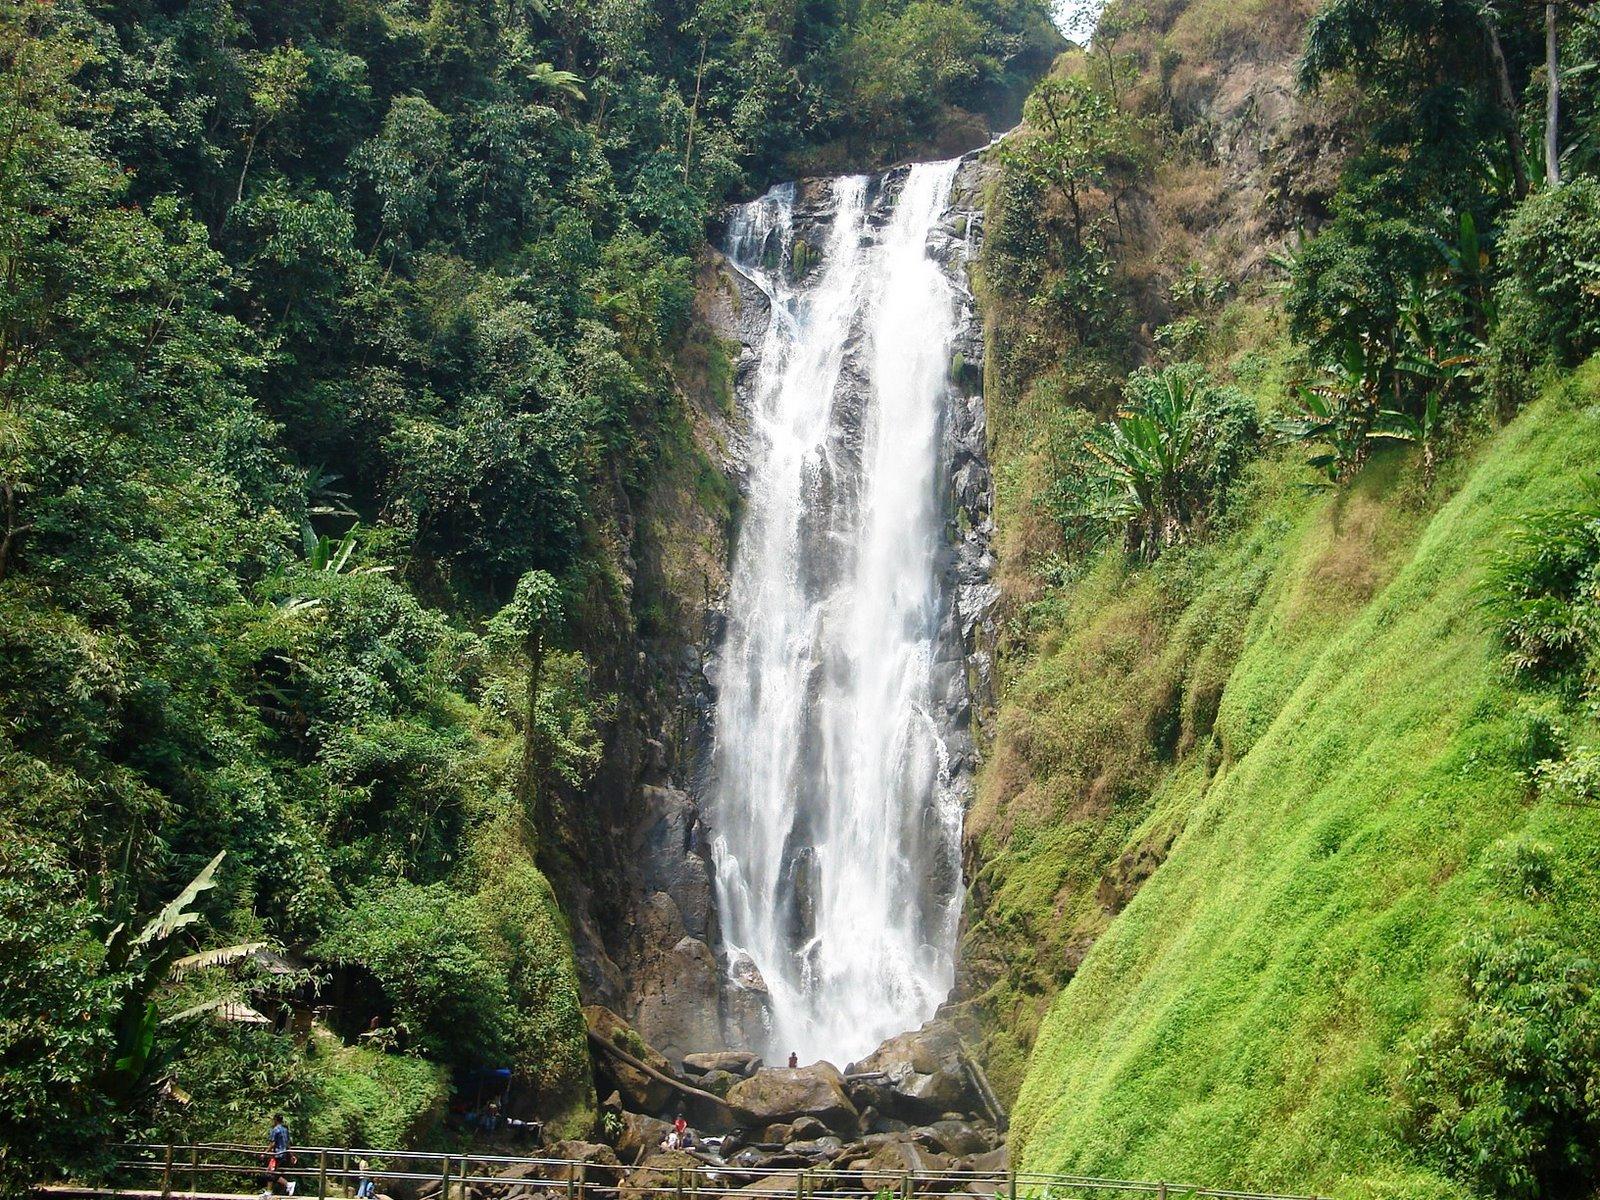 Objek wisata curup tenang bedegung merupakan air terjun tertinggi